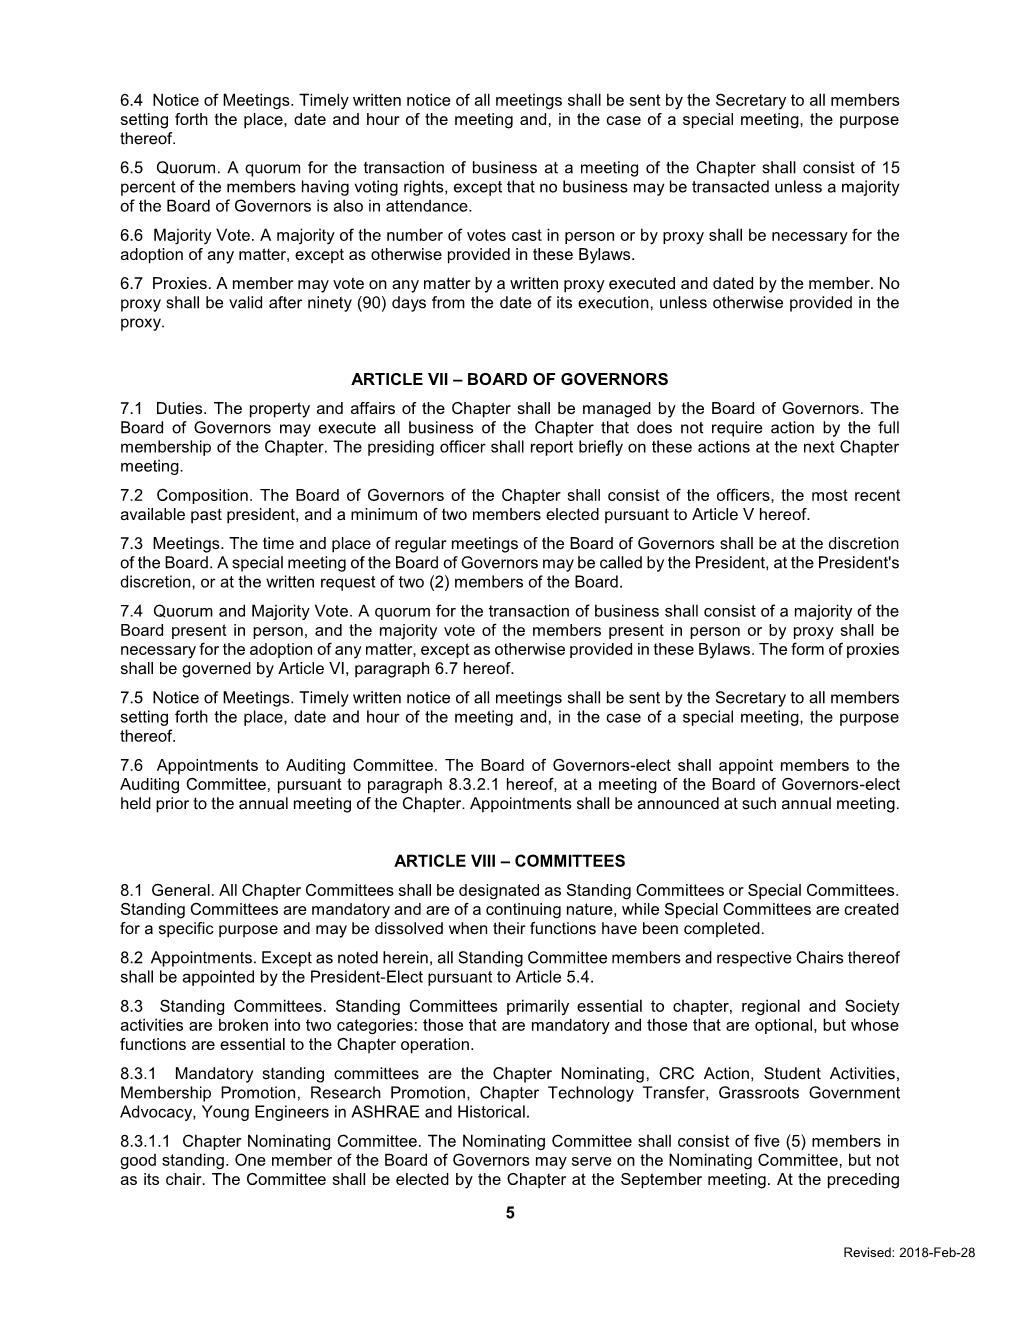 Southern Alberta Chapter CBL Page 005.png